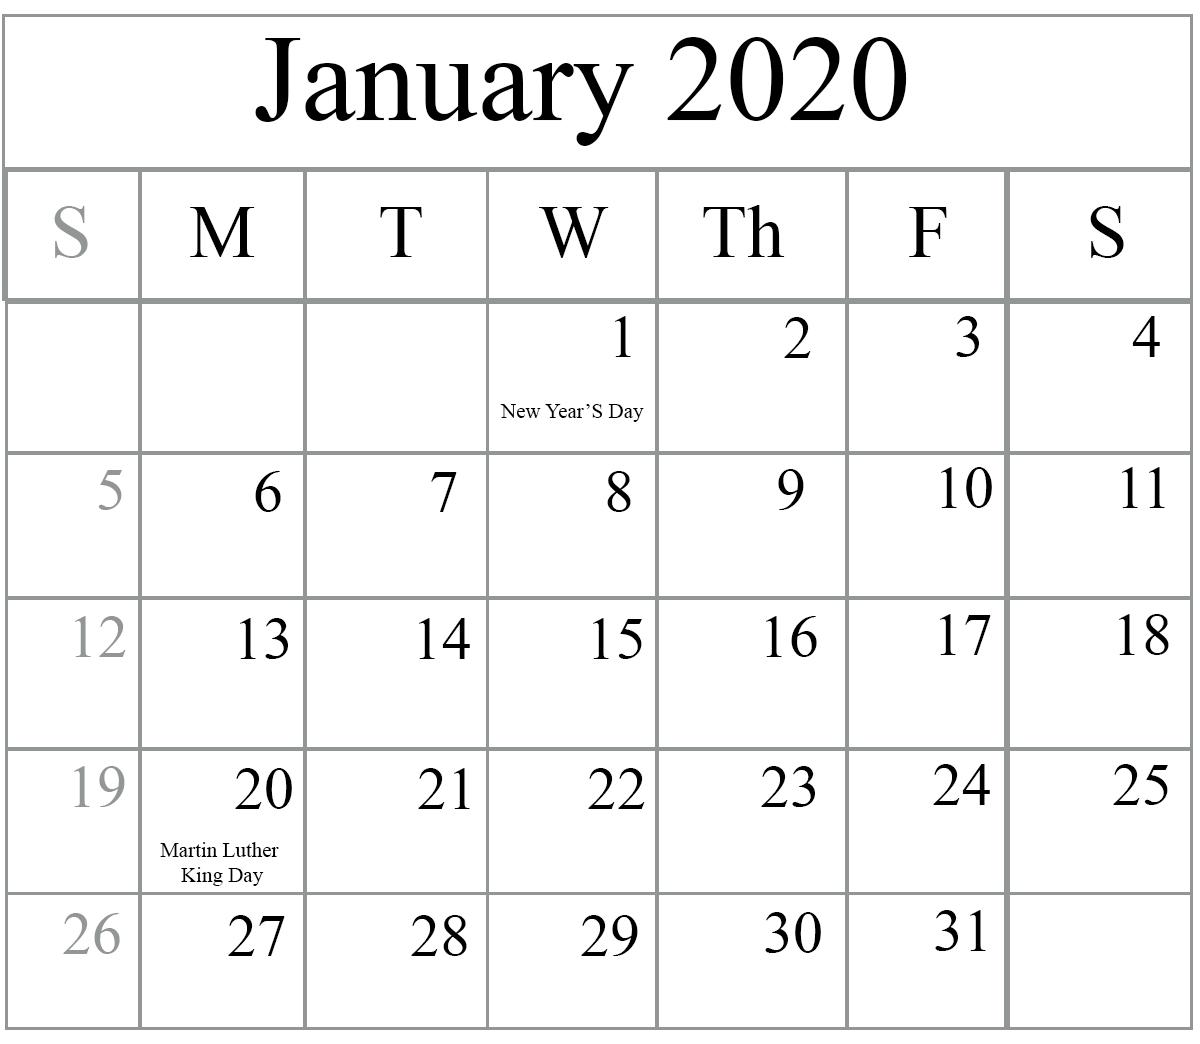 January 2020 Calendar With Holidays Wallpaper